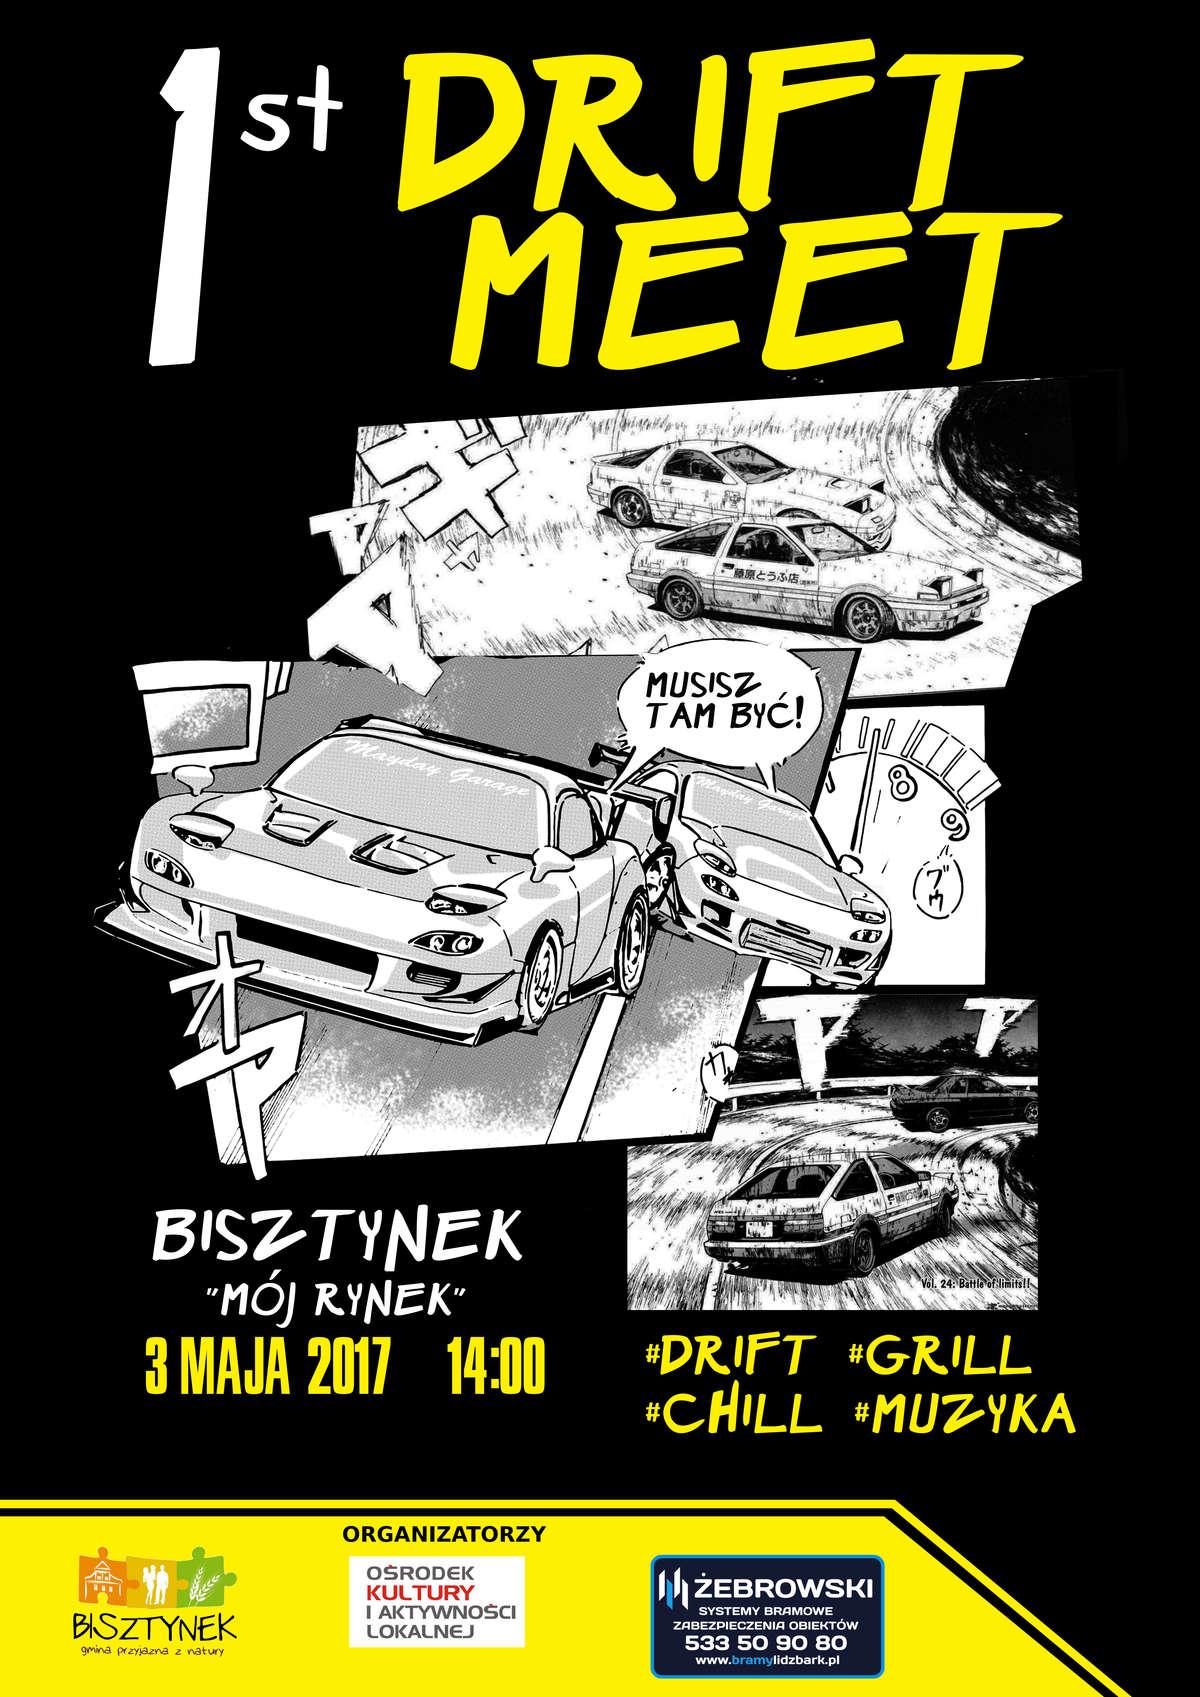 Pierwszy Drift Meet w Bisztynku - full image